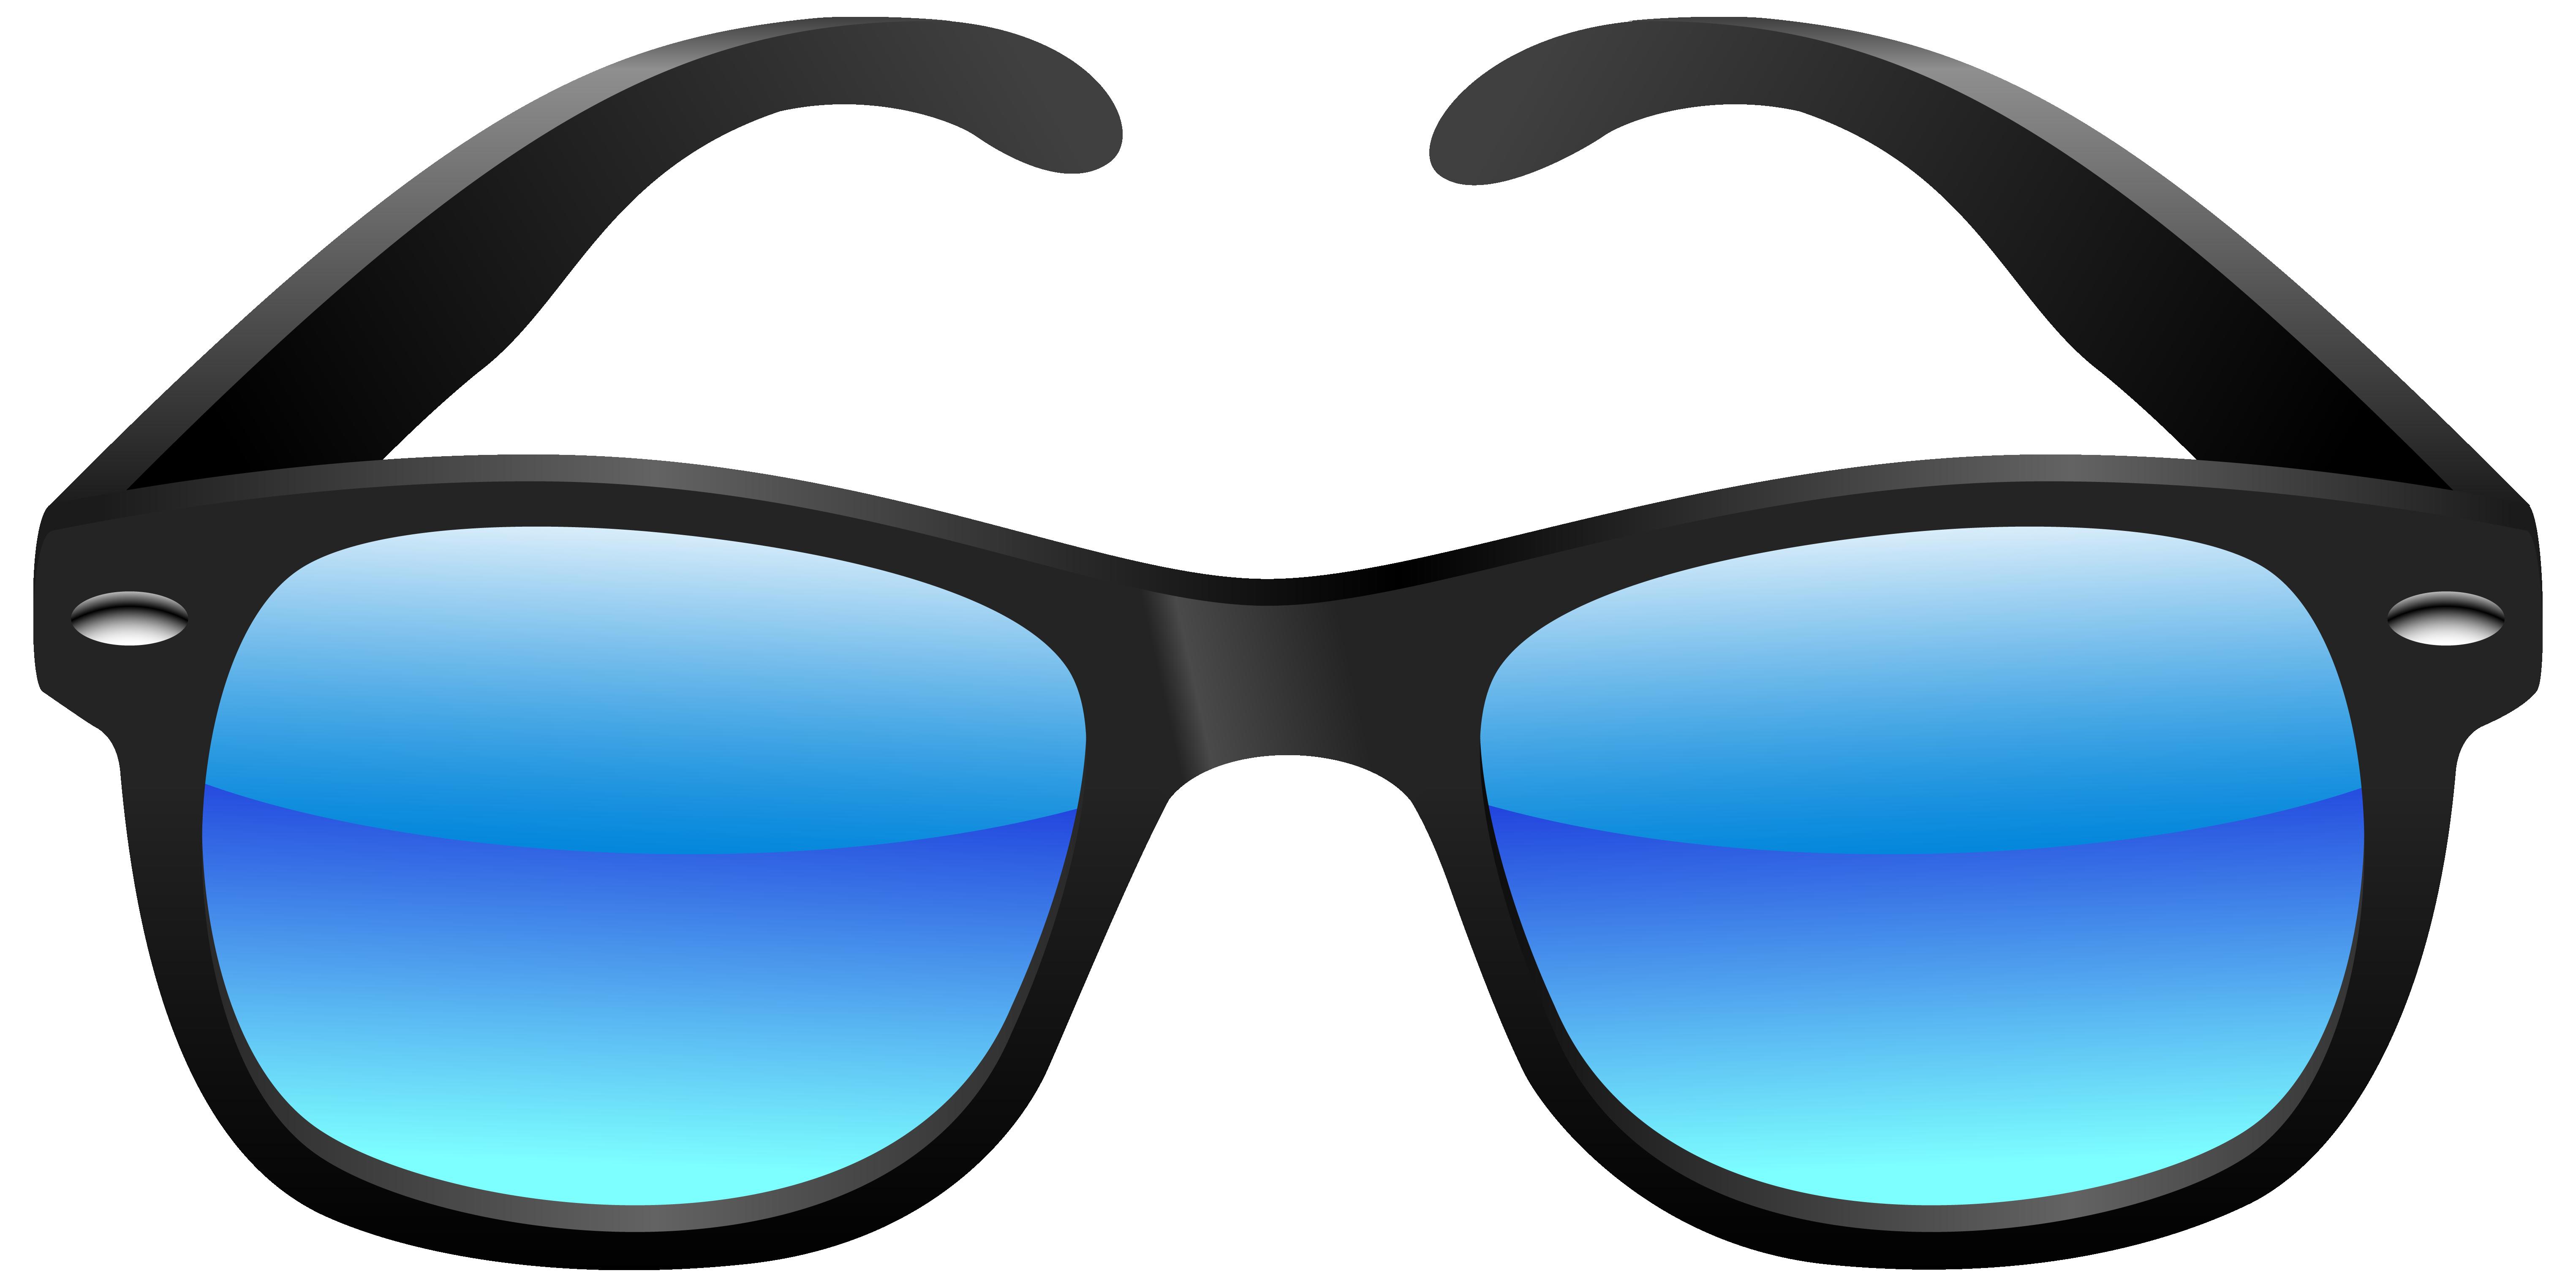 Asl sign for eyeglasses clipart 6 » Clipart Station.